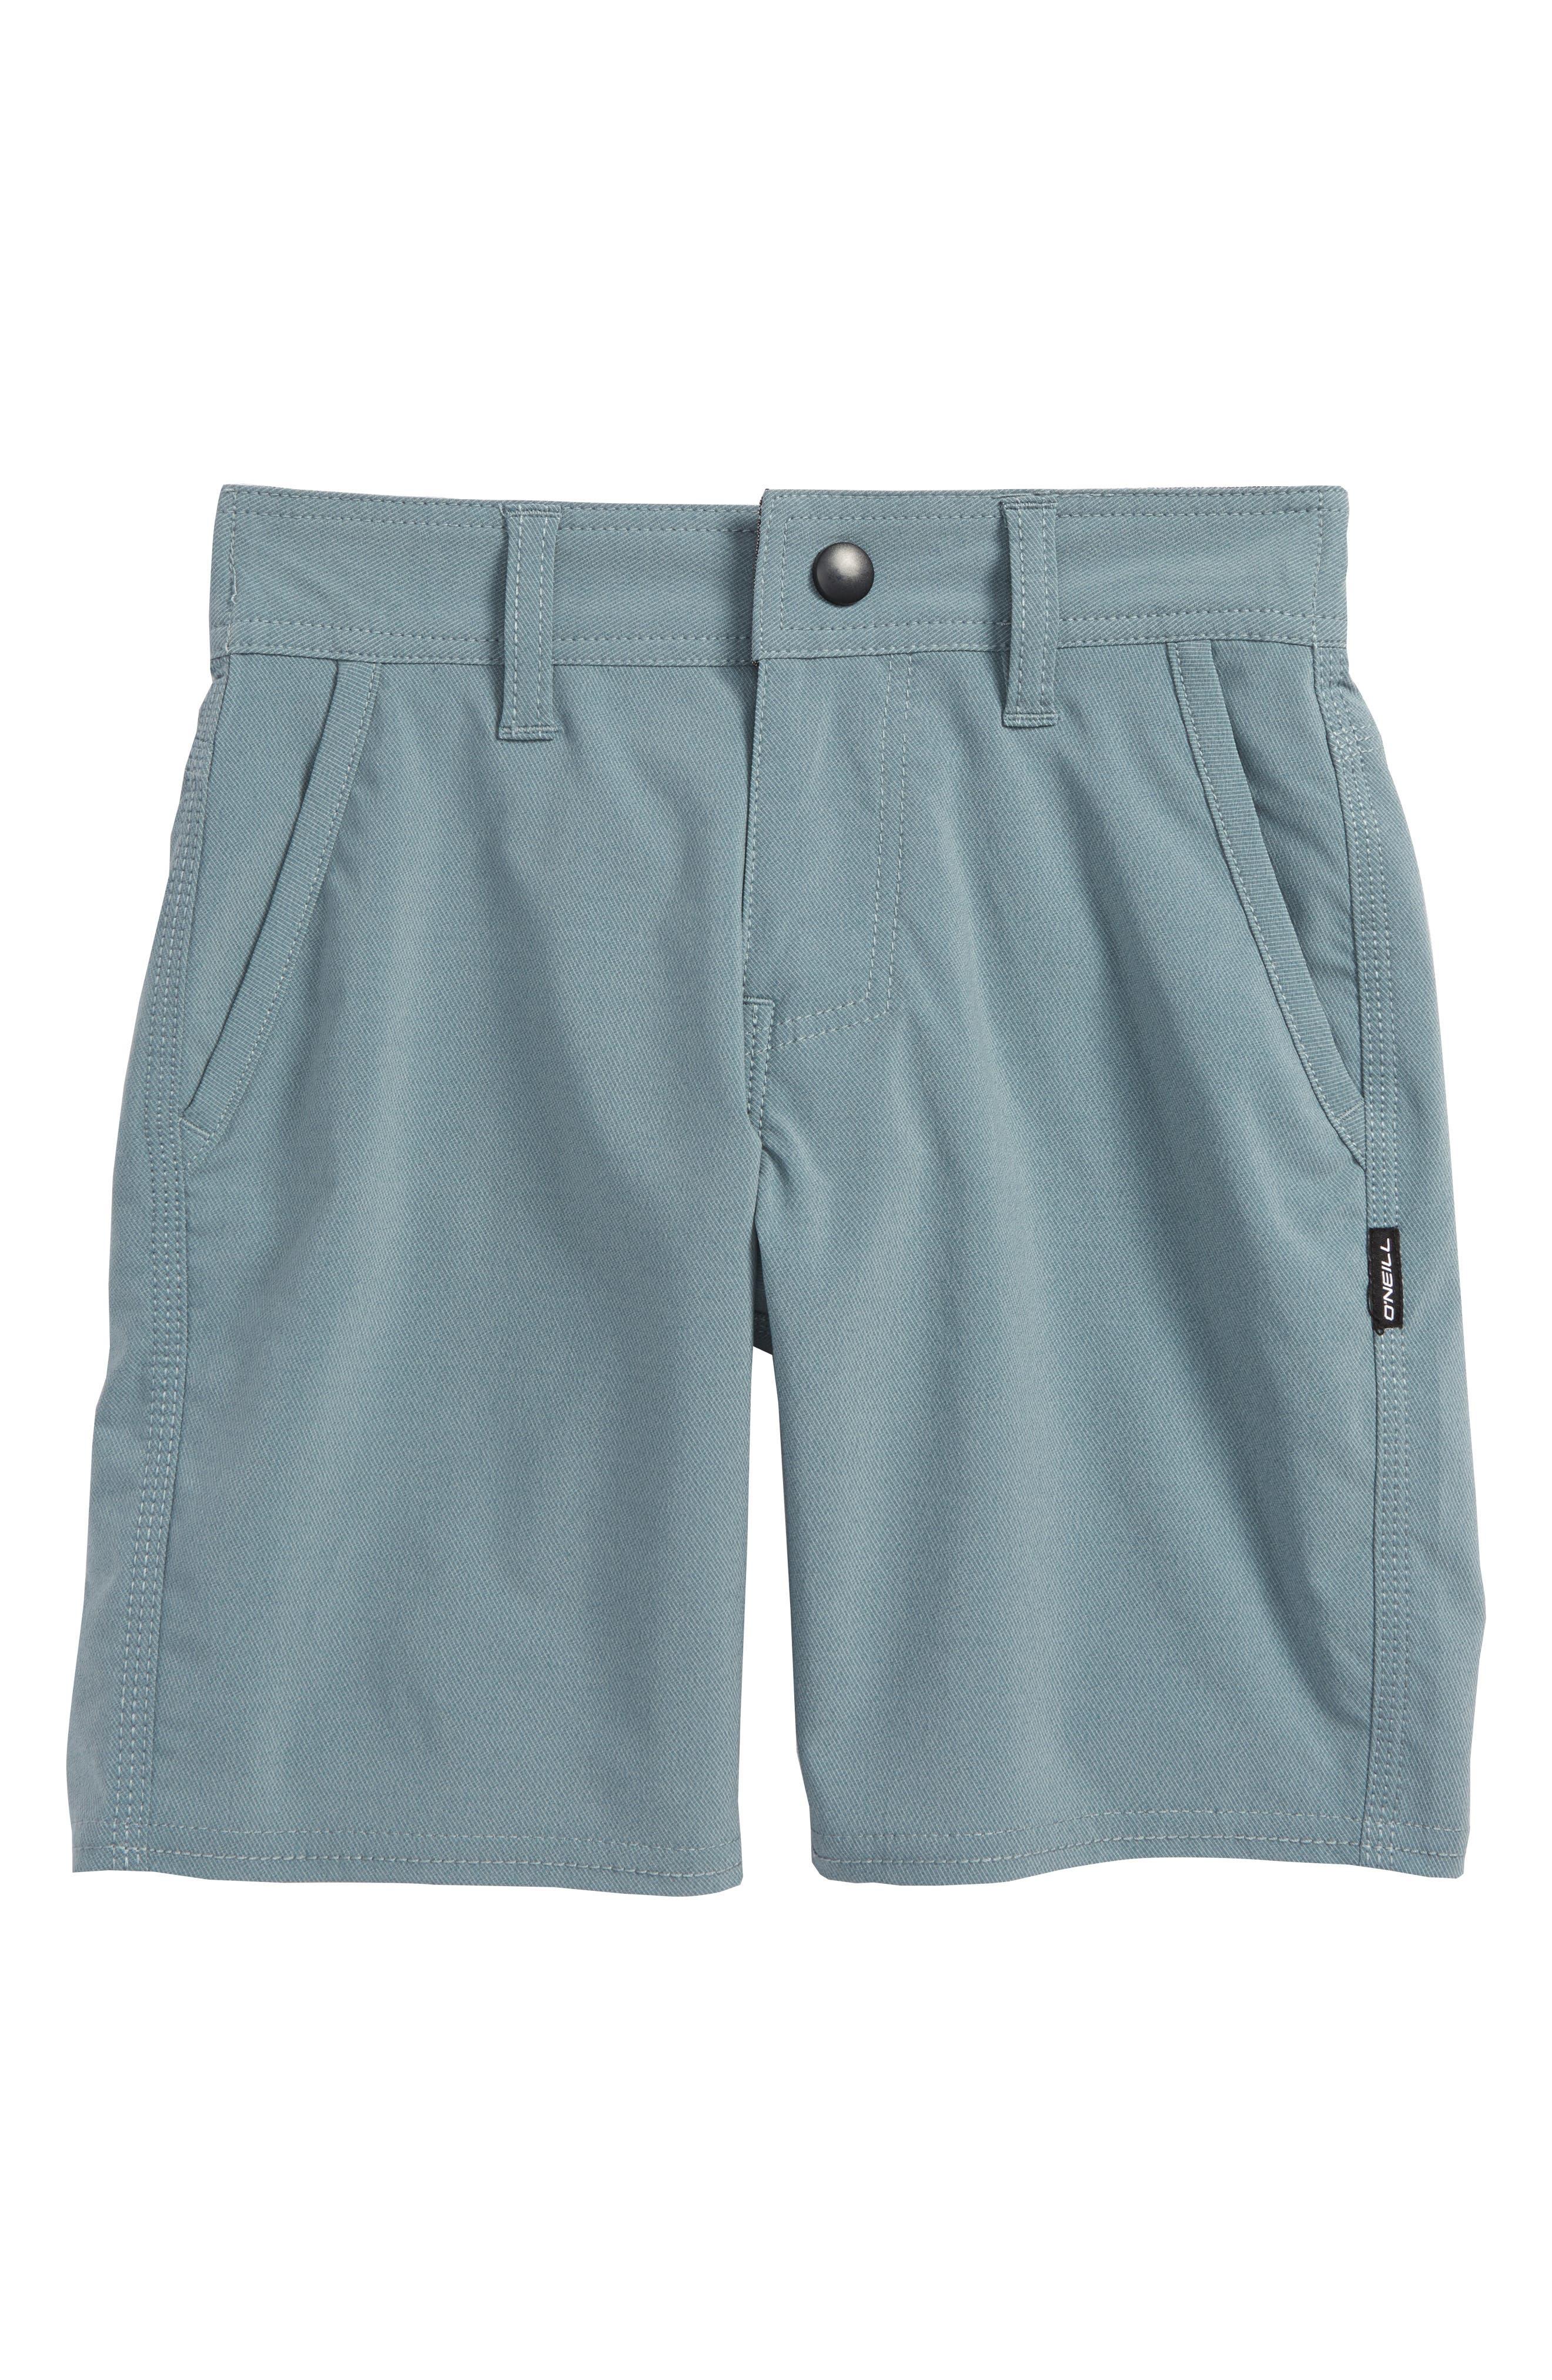 O'Neill Stockton Hybrid Shorts (Toddler Boys)